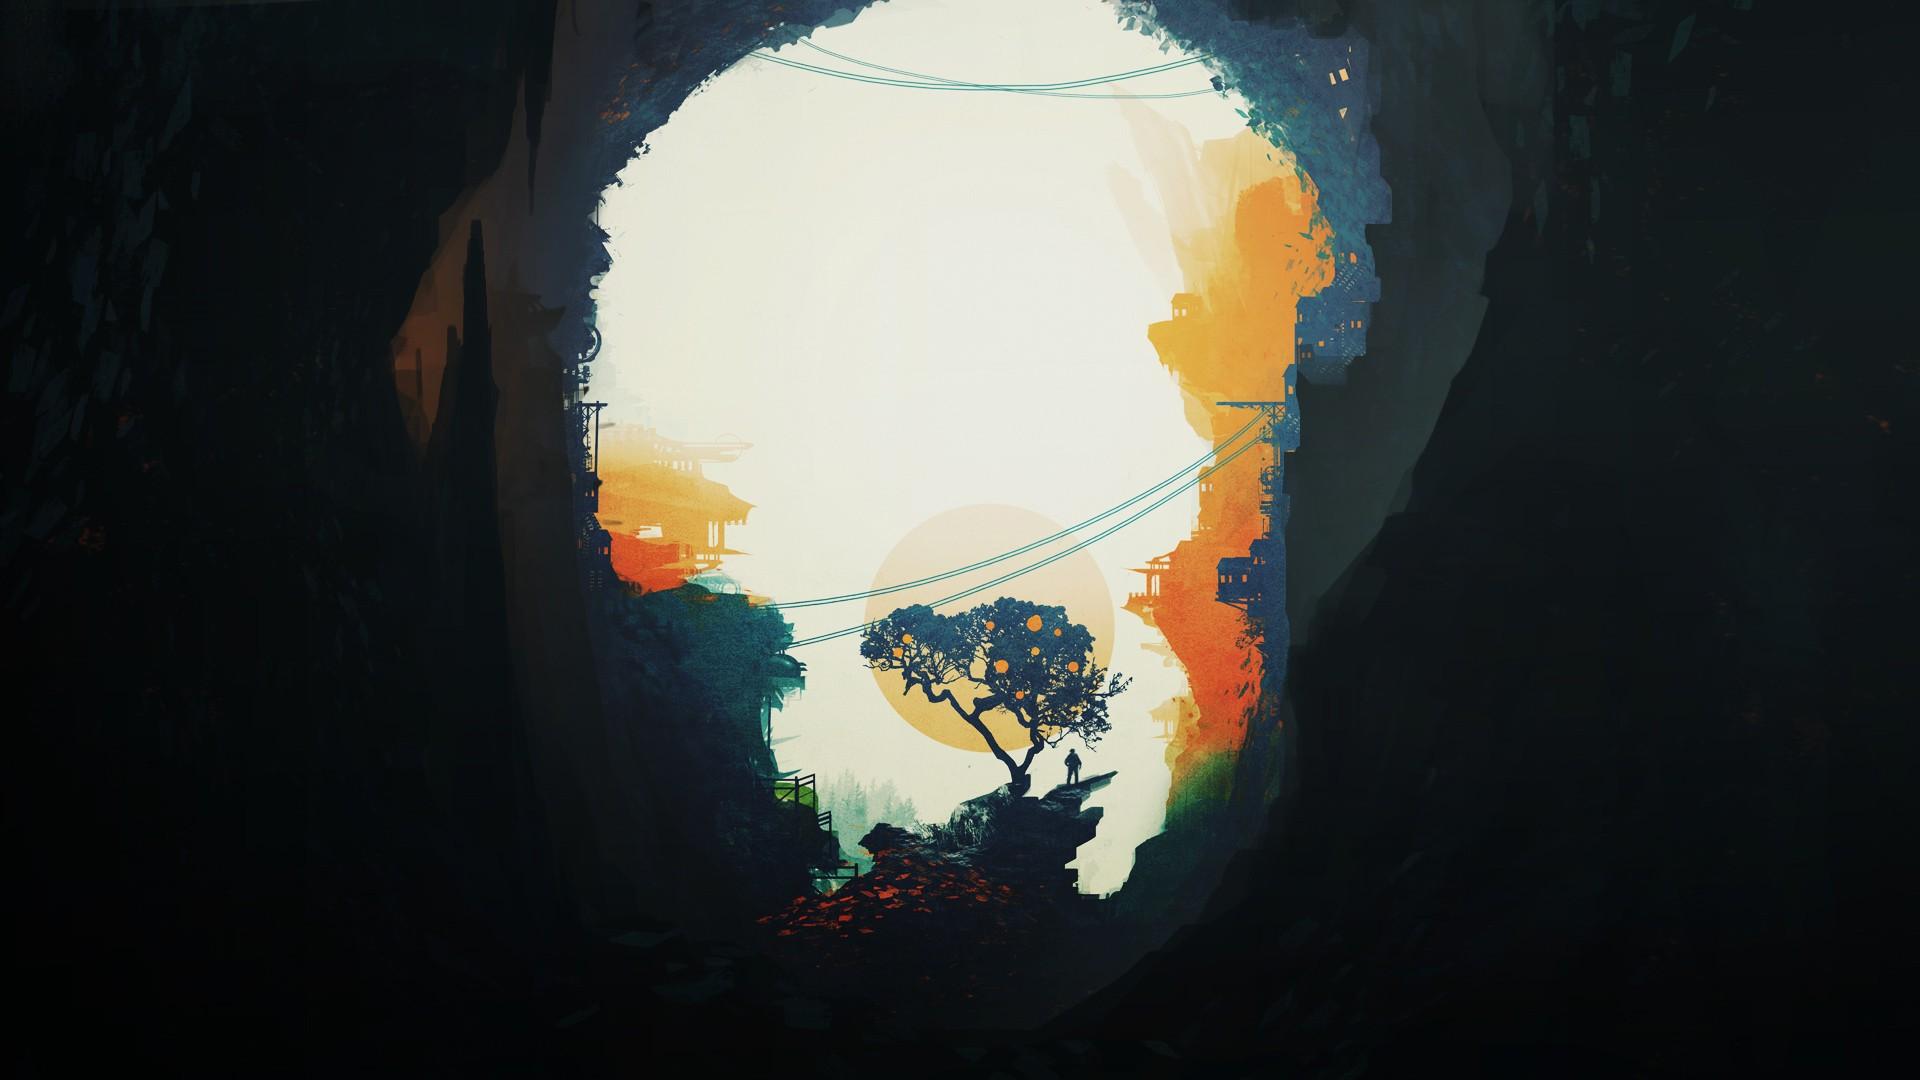 General 1920x1080 minimalism digital art artwork trees landscape cave Sun